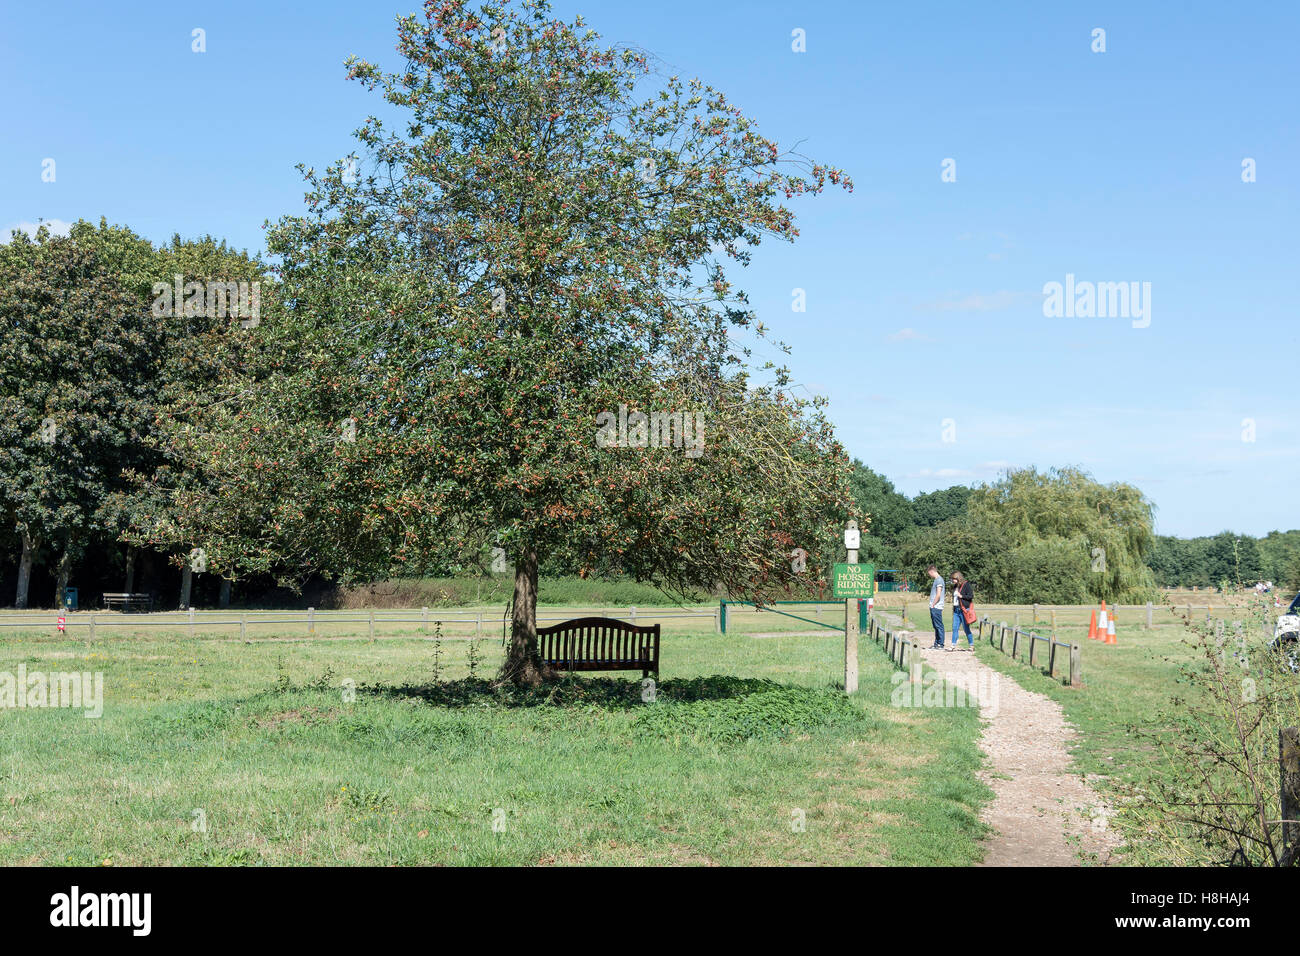 Ripley vert, Ripley, Surrey, Angleterre, Royaume-Uni Photo Stock